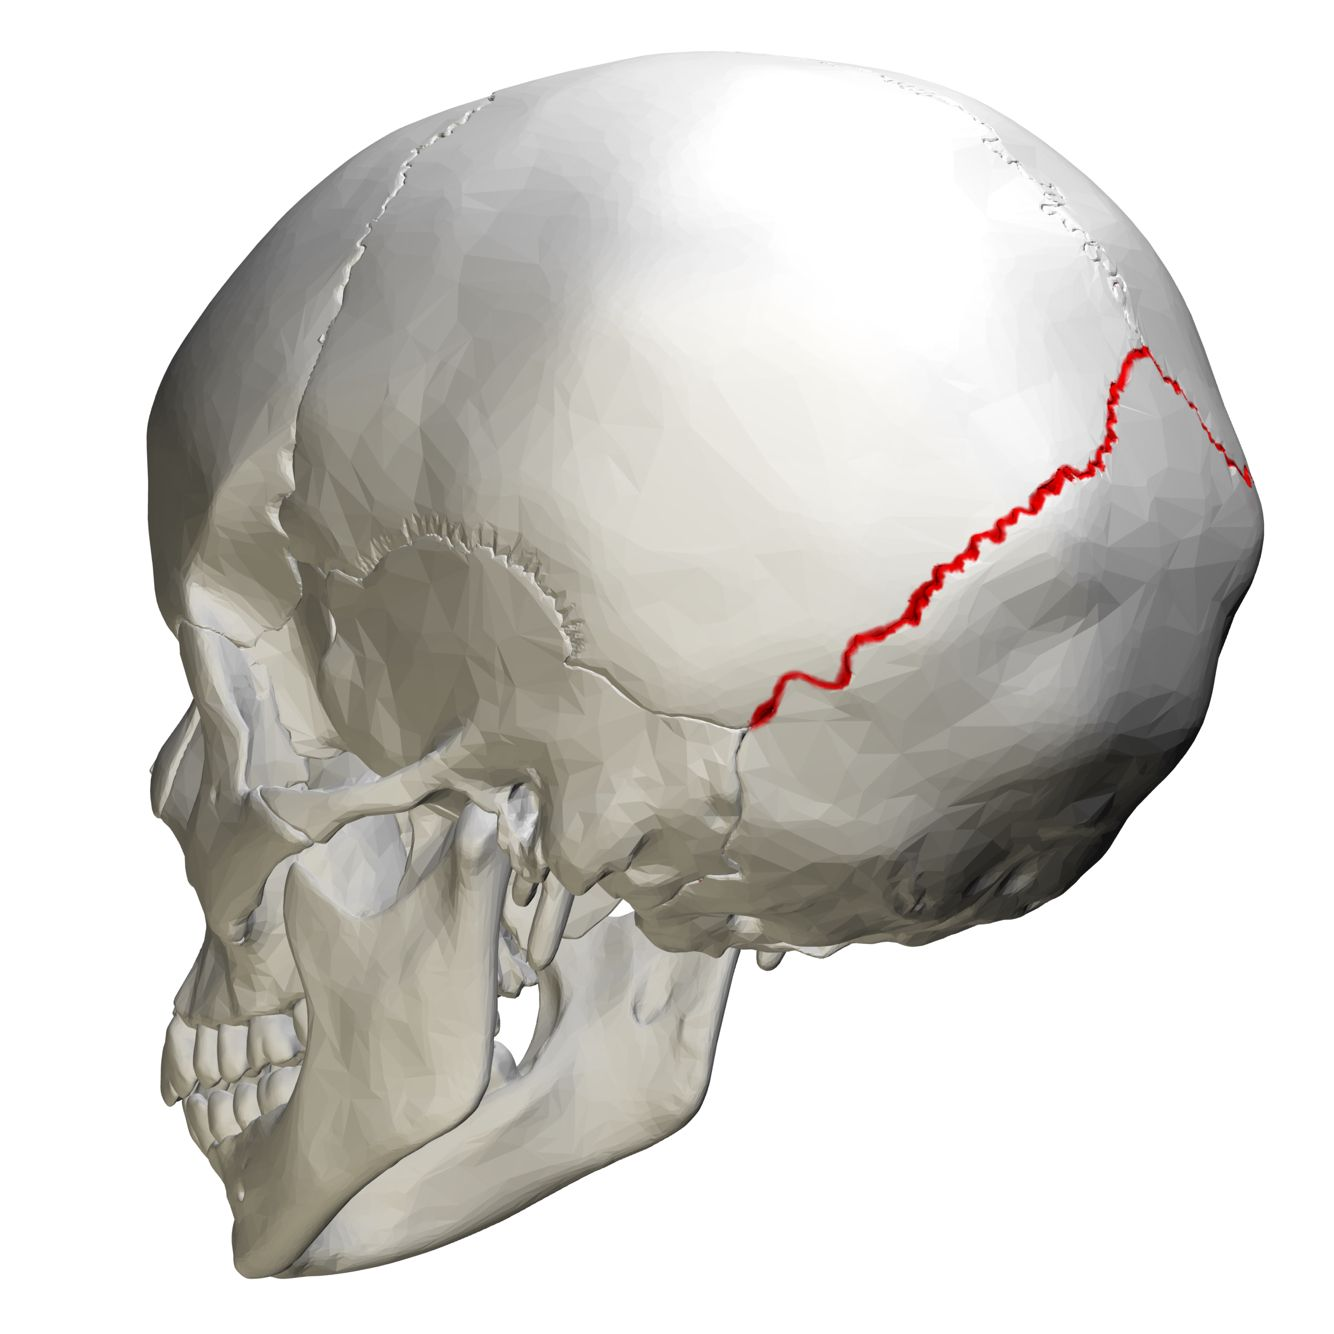 Lambdoid Suture Articulate Parietal Bones With Occipital